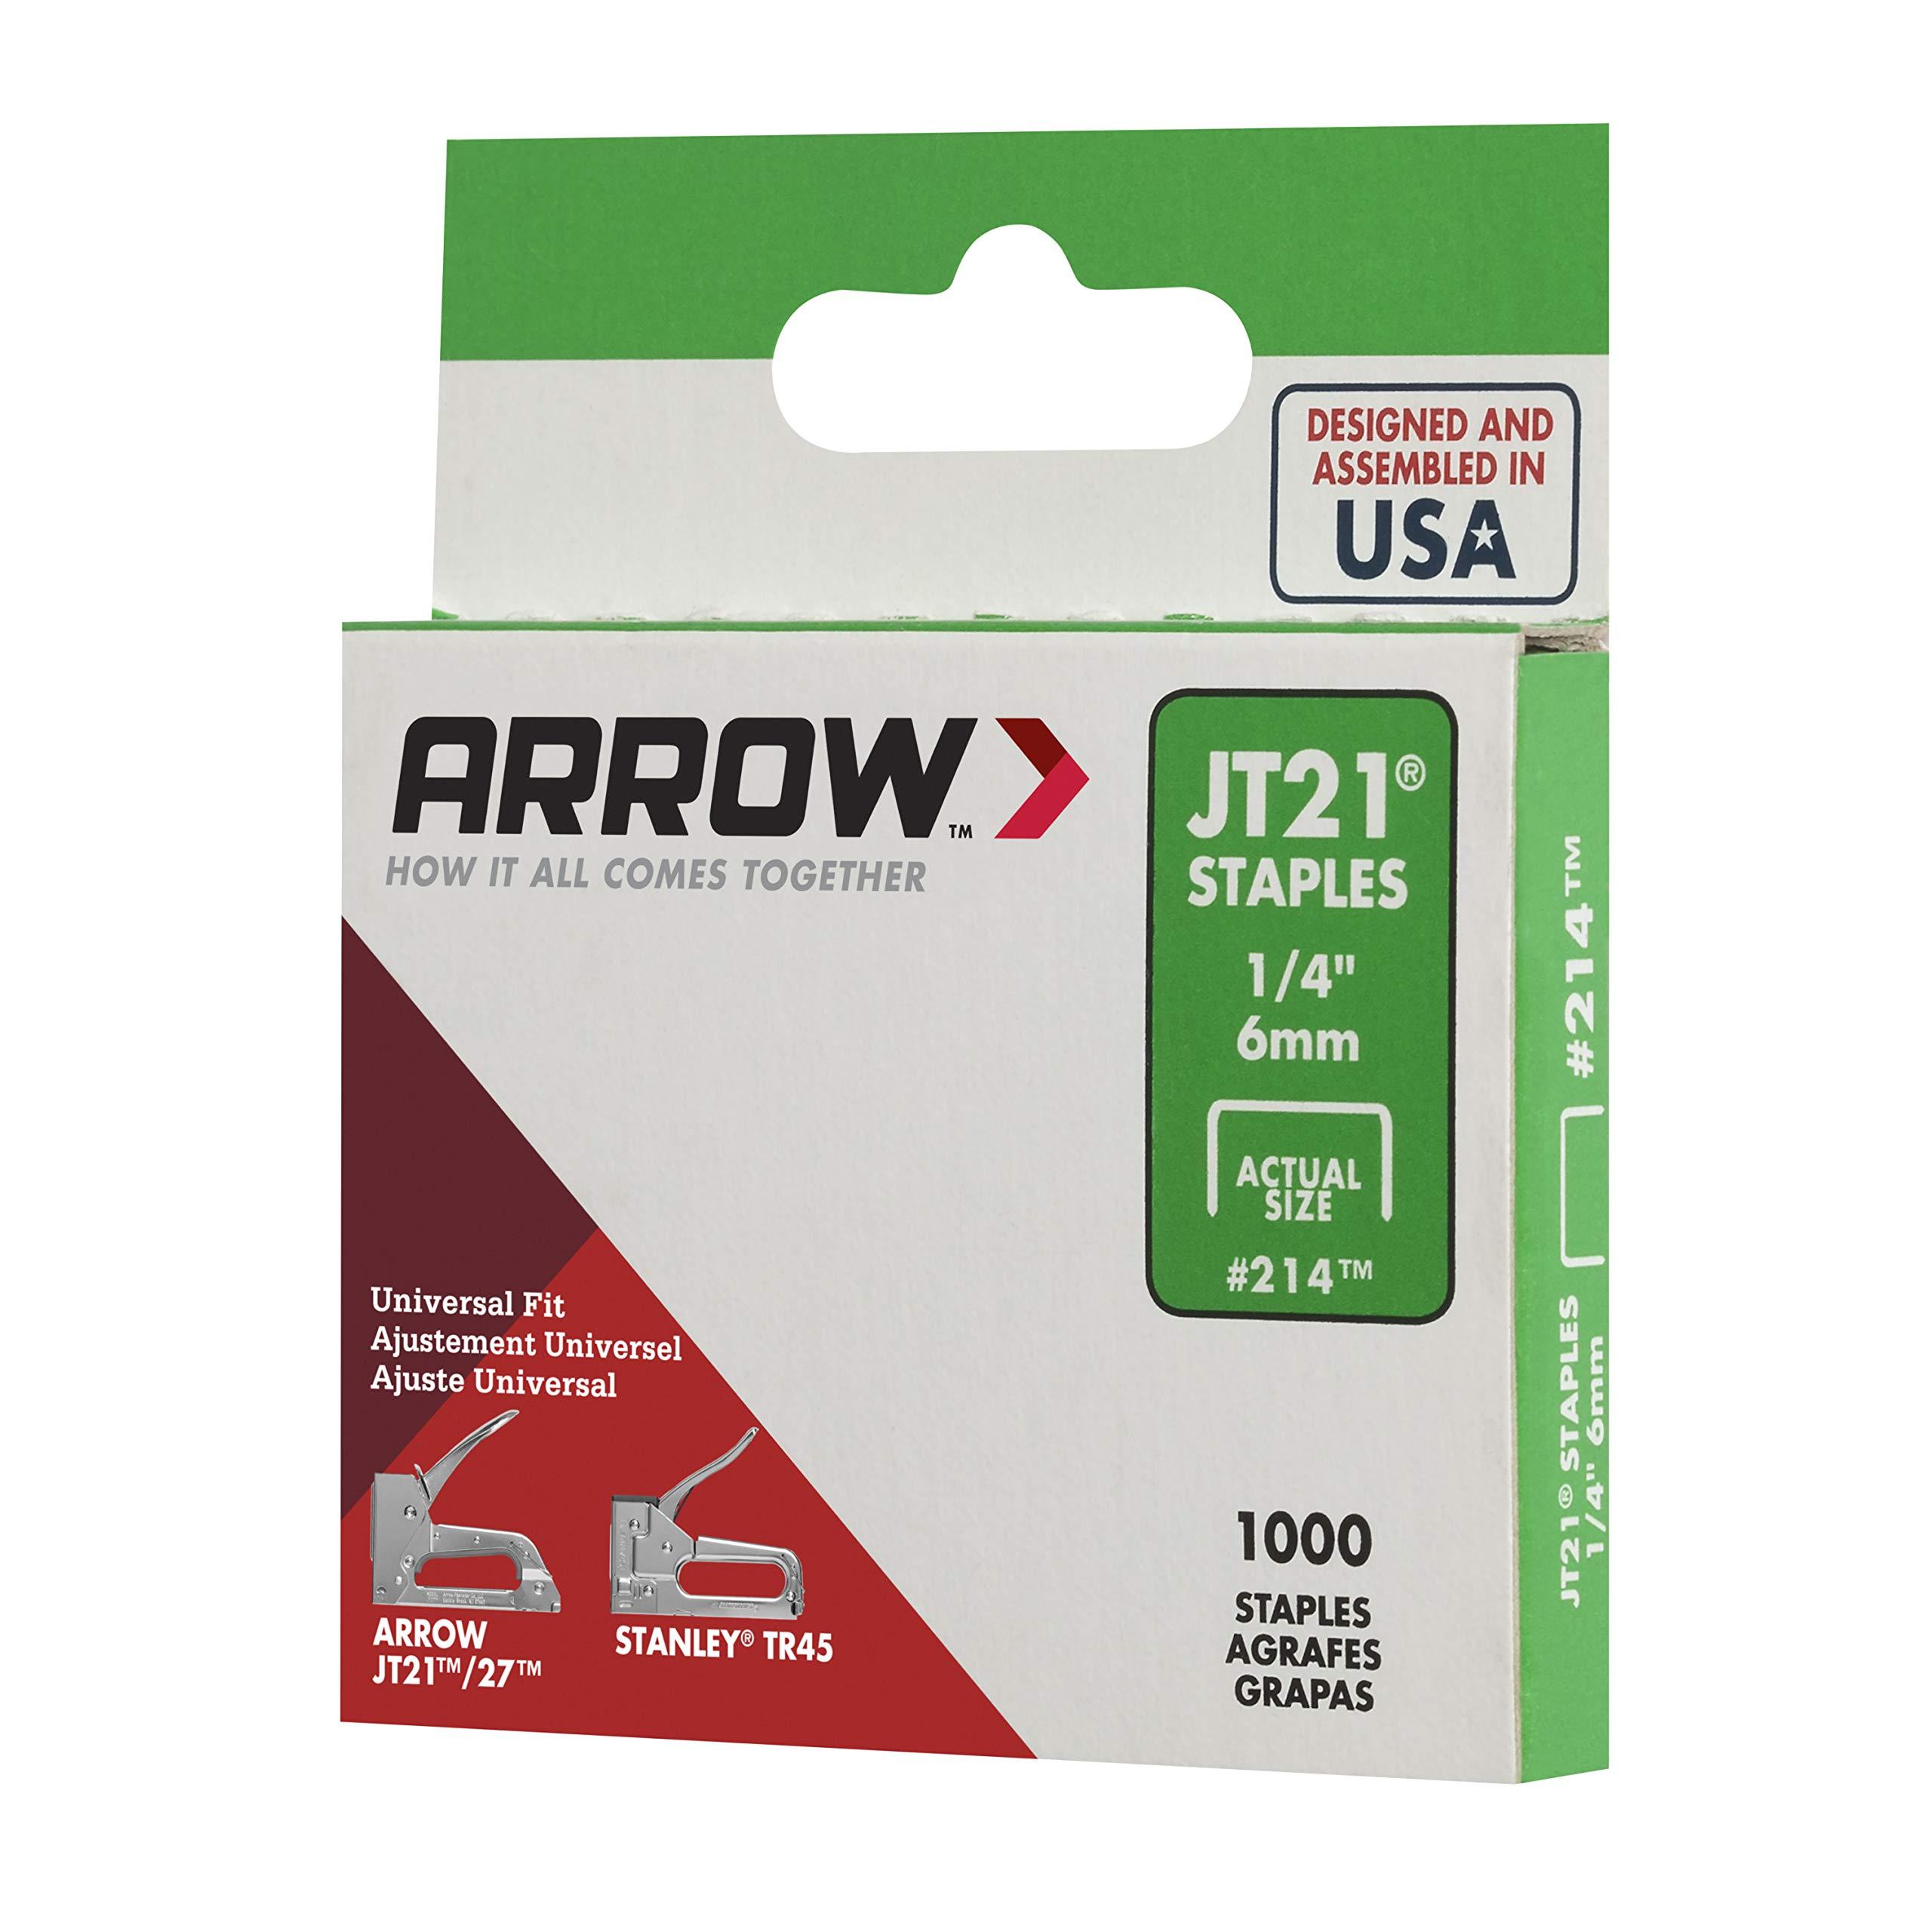 1,000-Staples New Arrow Fastener 214 Genuine JT21 1//4-Inch Staples